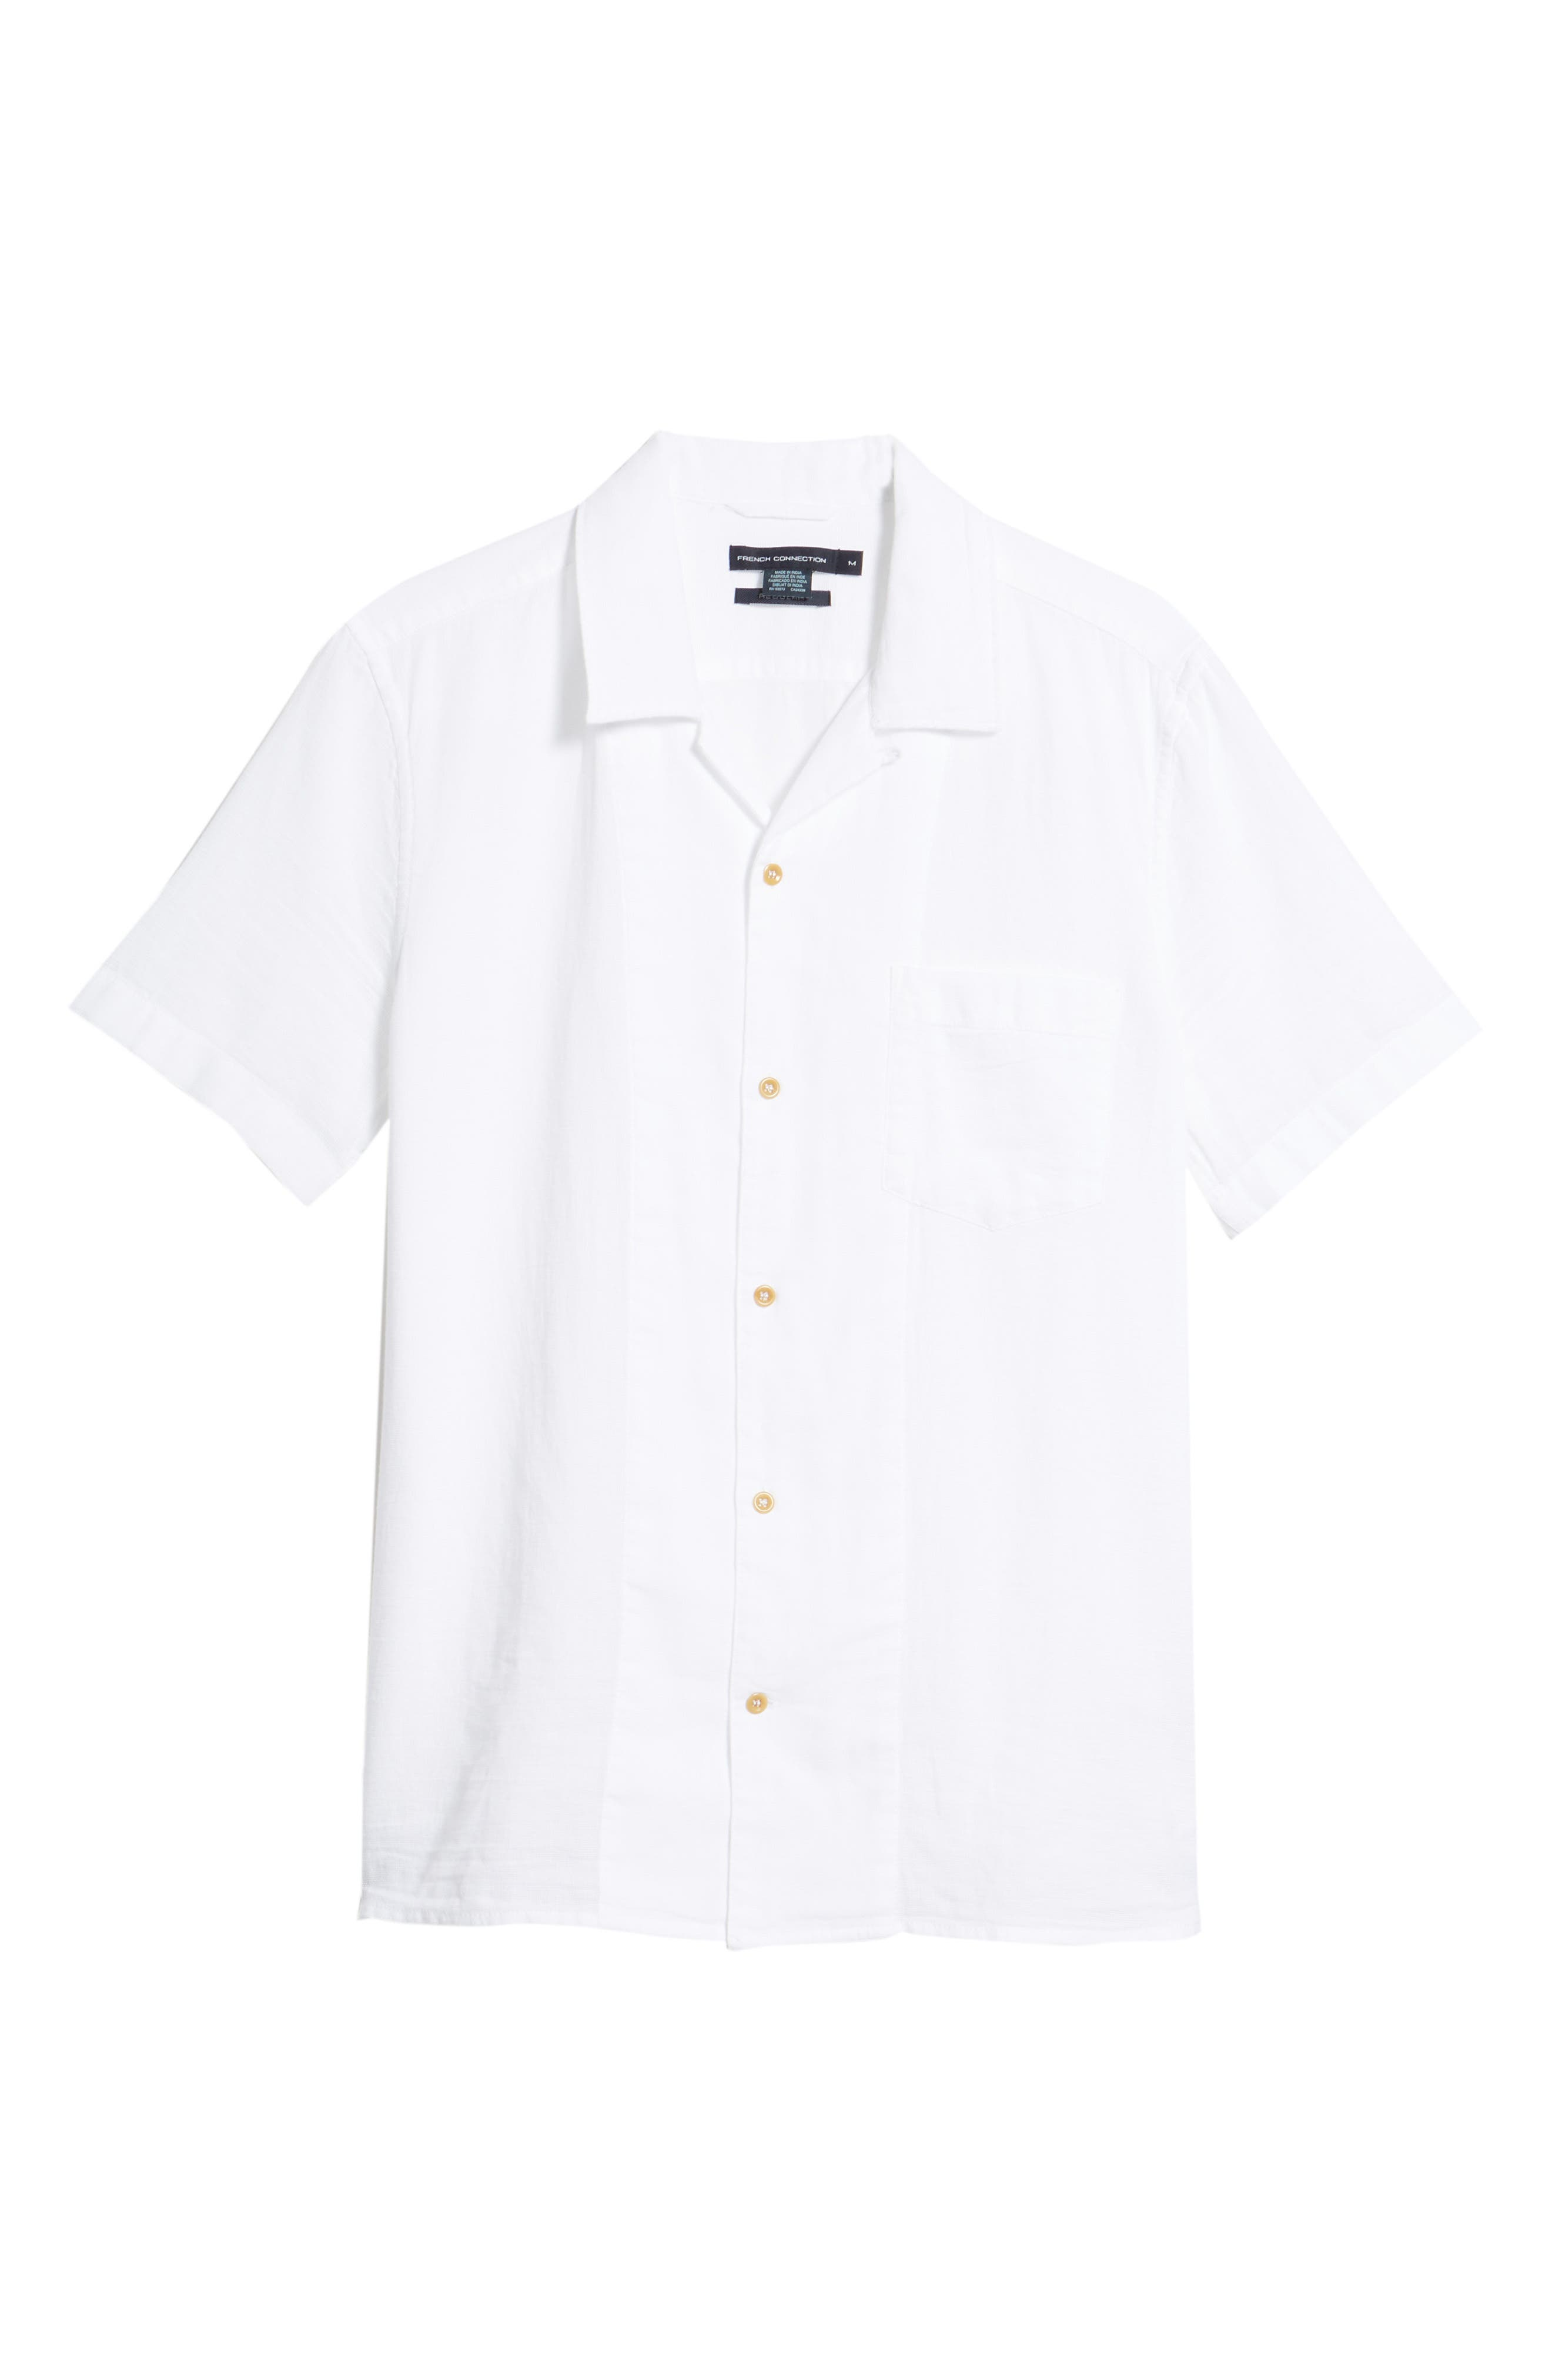 Regular Fit Textured Dobby Camp Shirt,                             Alternate thumbnail 6, color,                             100